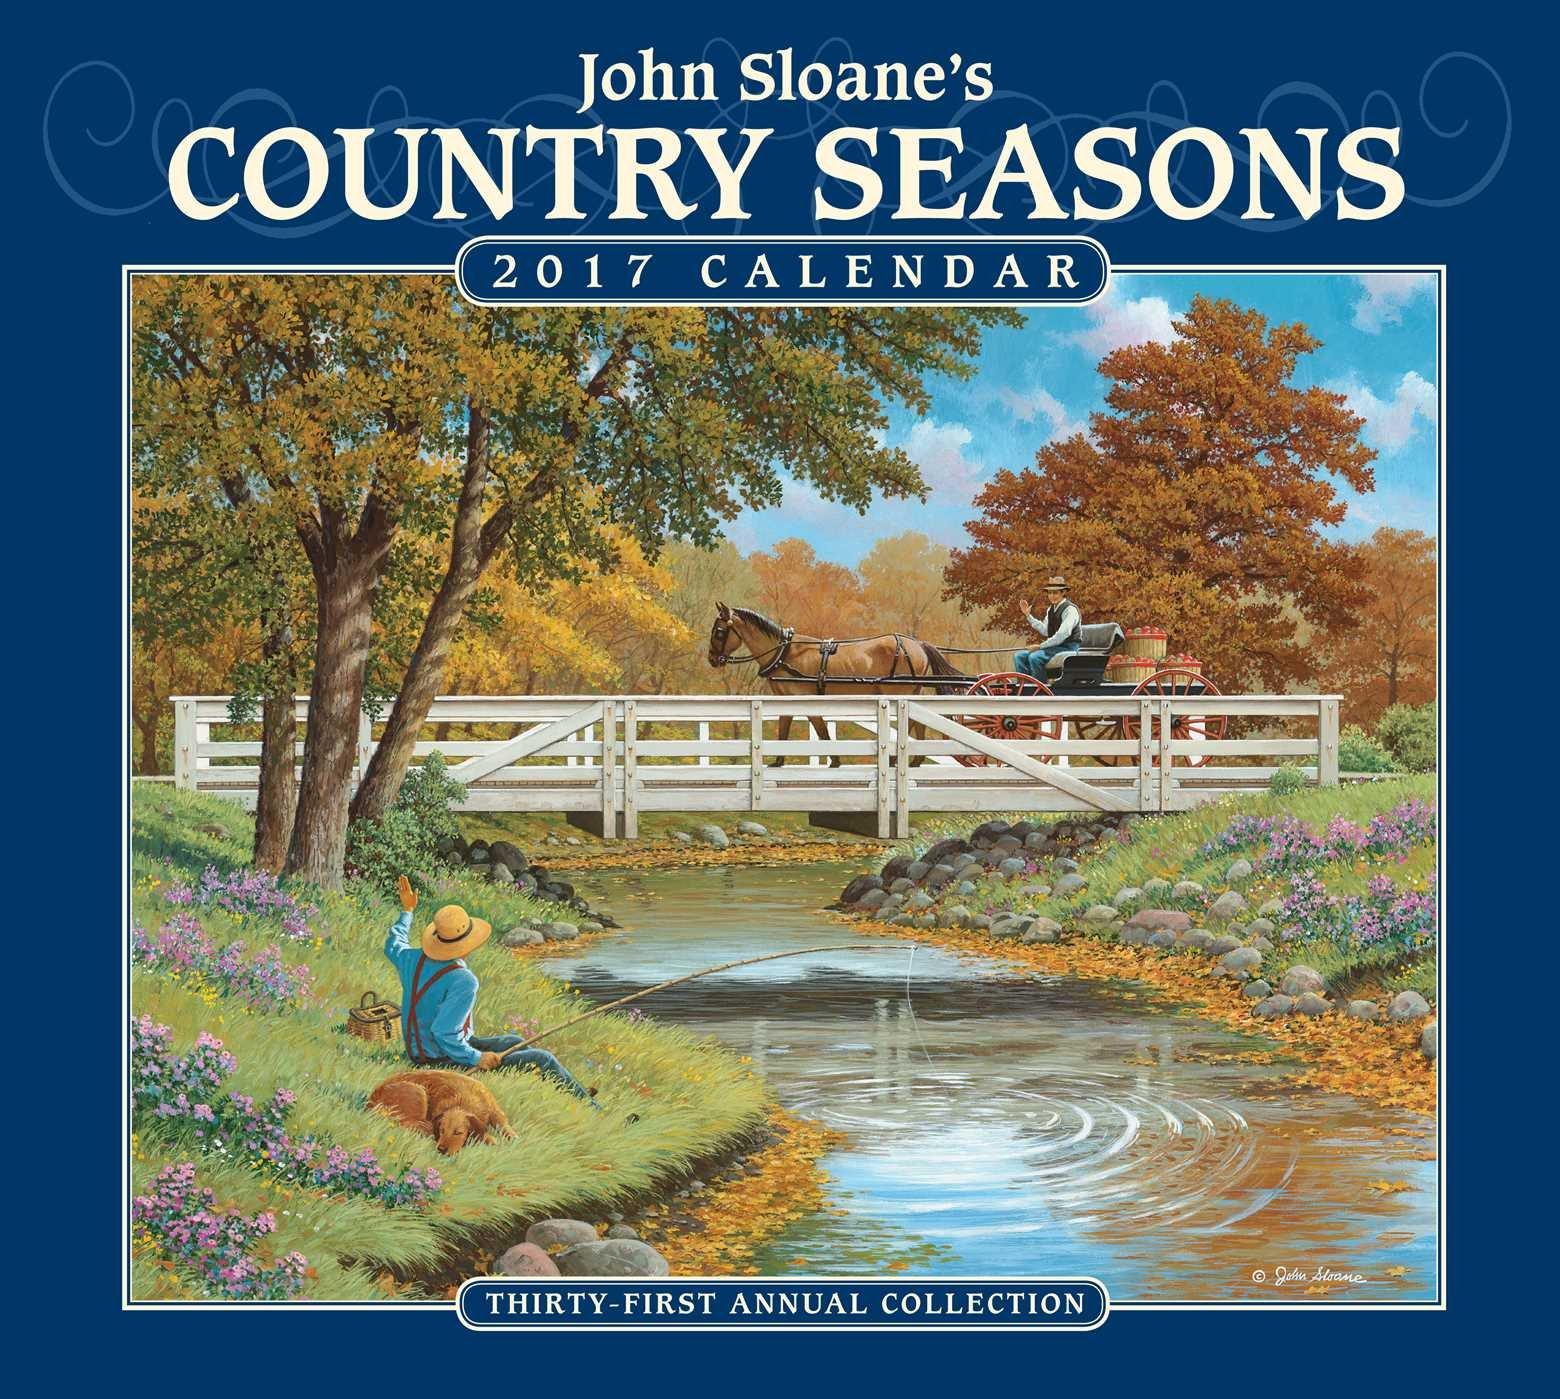 John Sloane's Country Seasons 2017 Deluxe Wall Calendar PDF